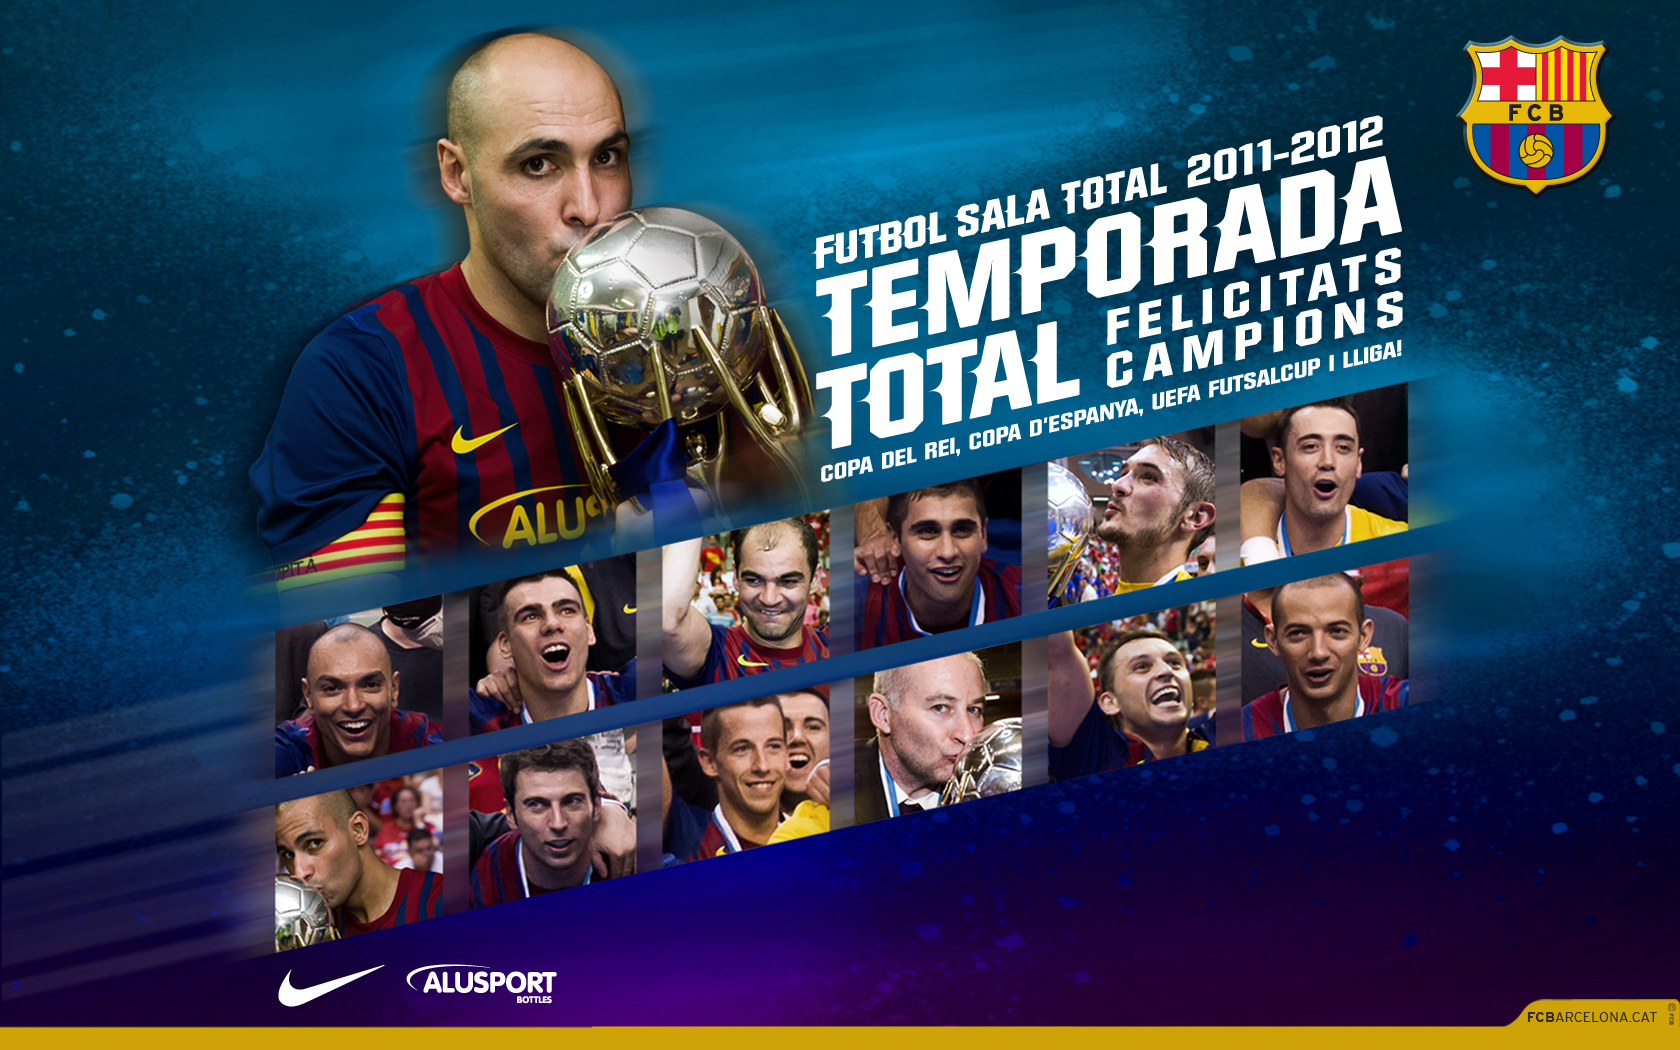 CAMPIONS · FUTBOL SALA - TEMPORADA 2011-12